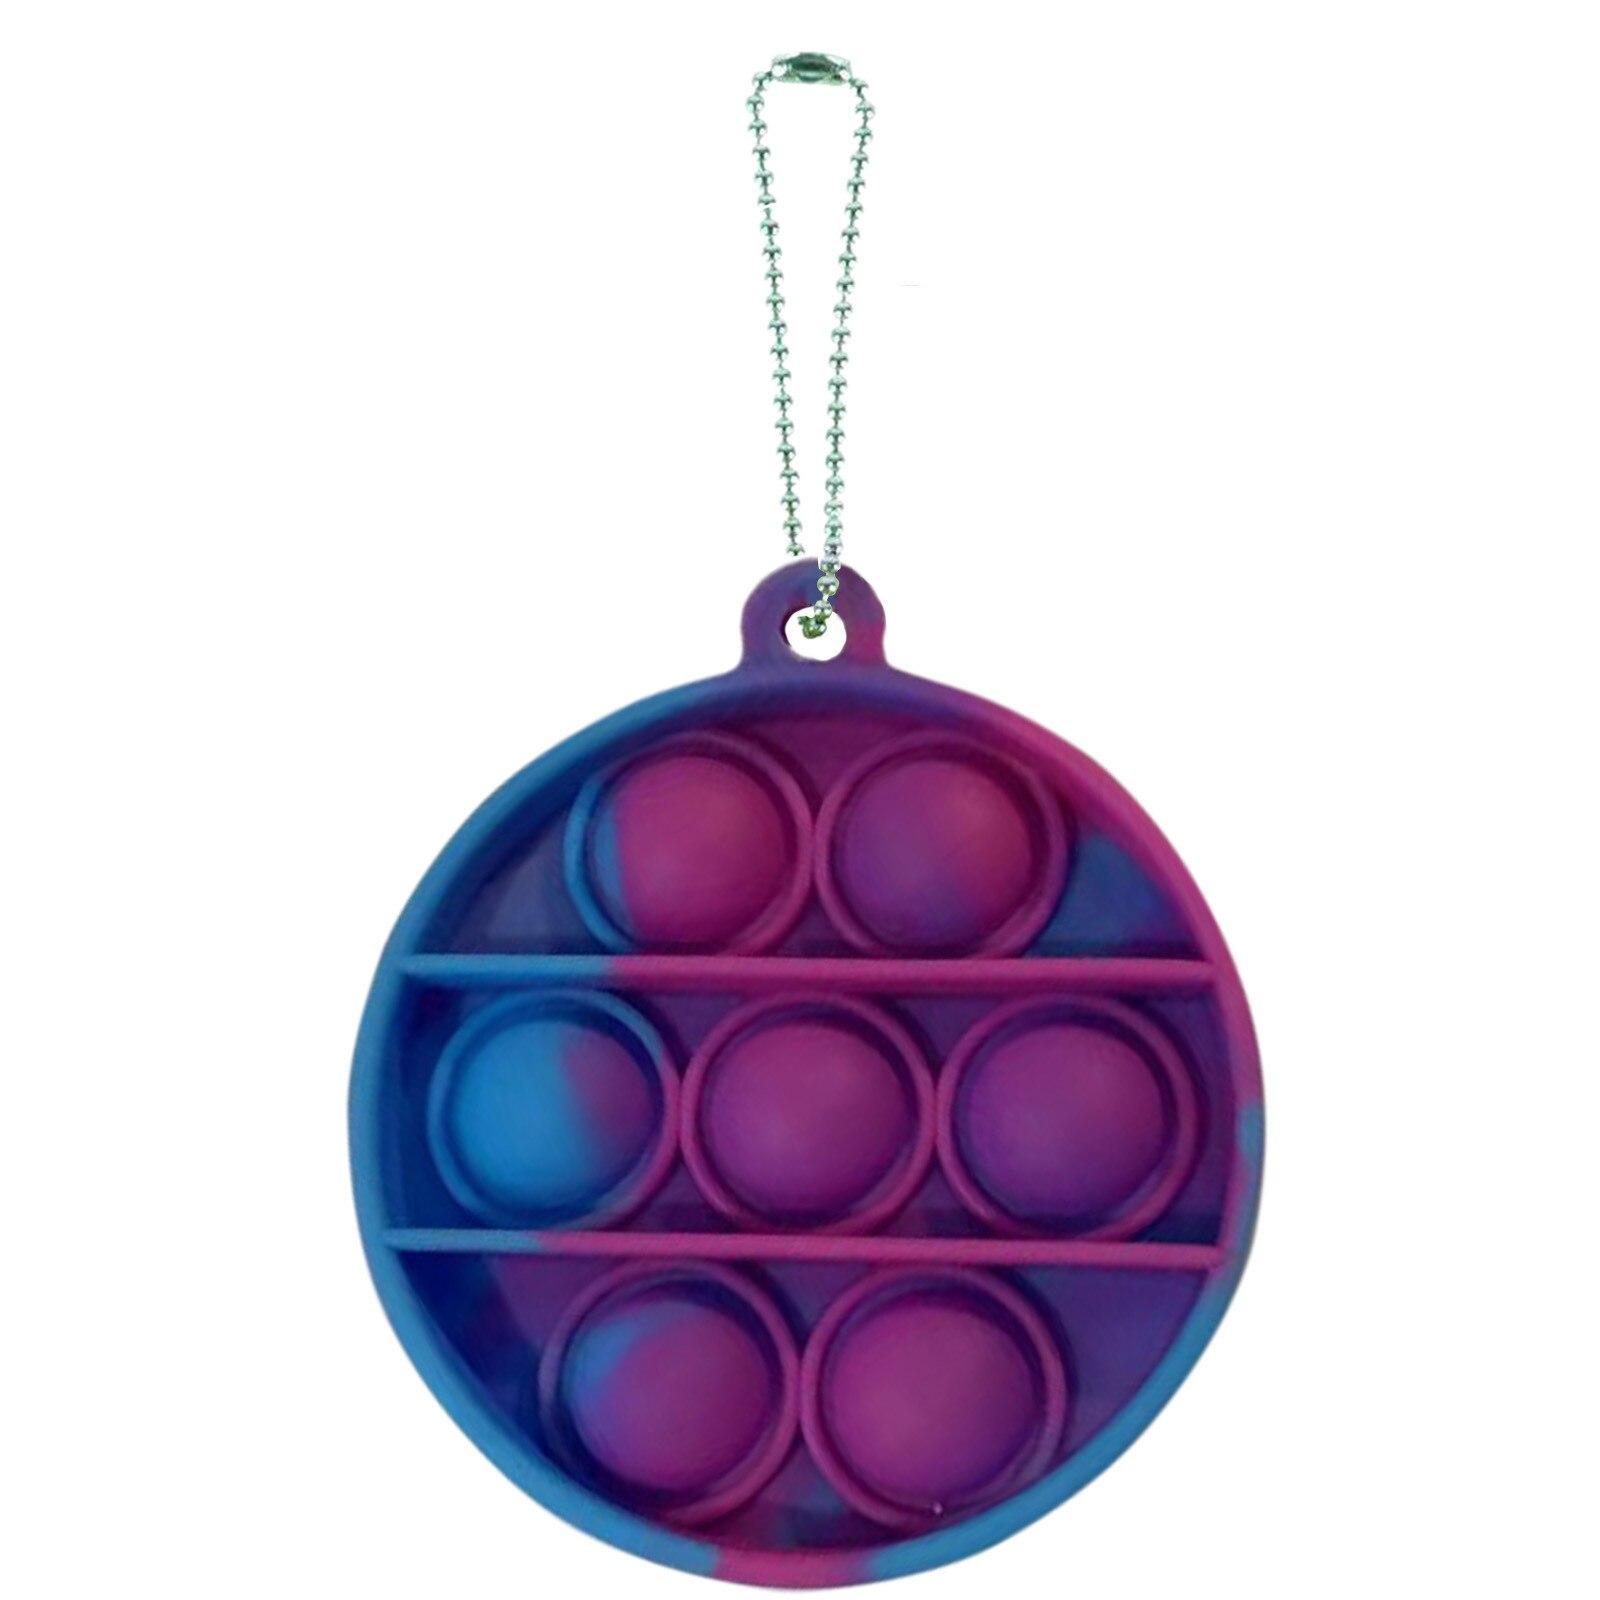 Key-Ring It-Fidget-Toys Educational-Toy Anti-Stress-Pop Push Bubble Adult Mini Children img3